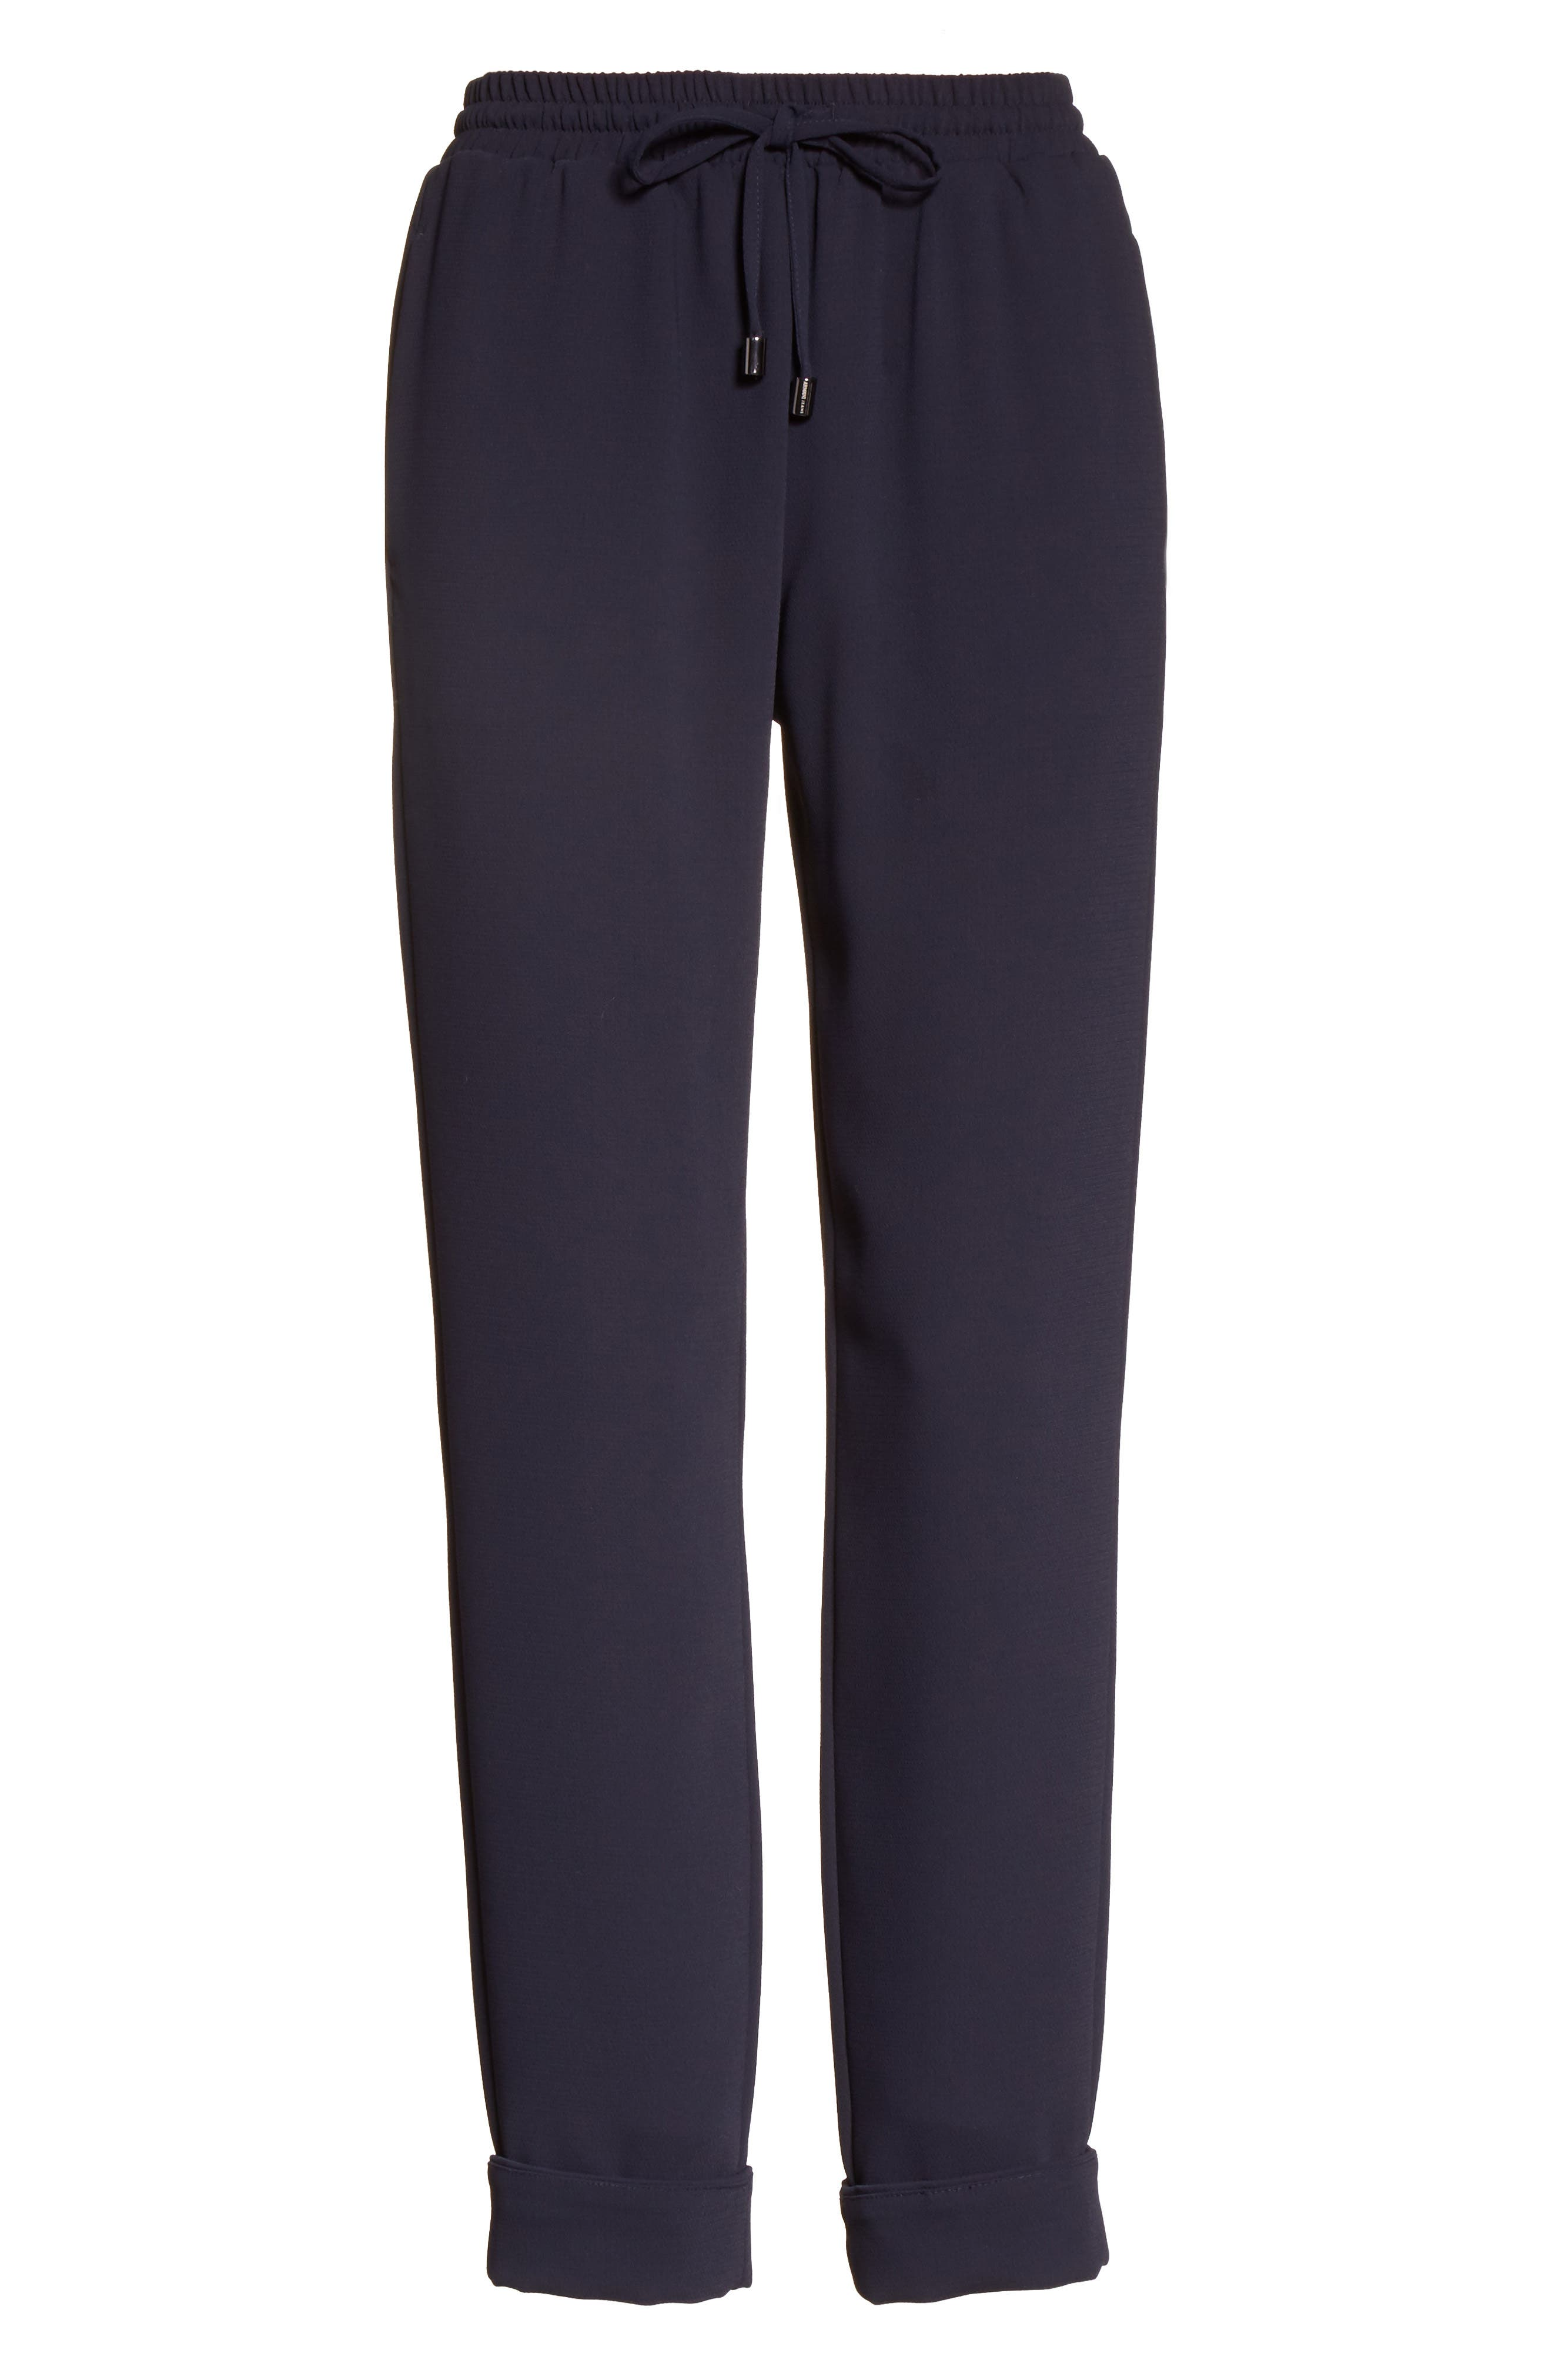 Armani Jeans Tech Jogger Pants,                             Alternate thumbnail 4, color,                             Navy